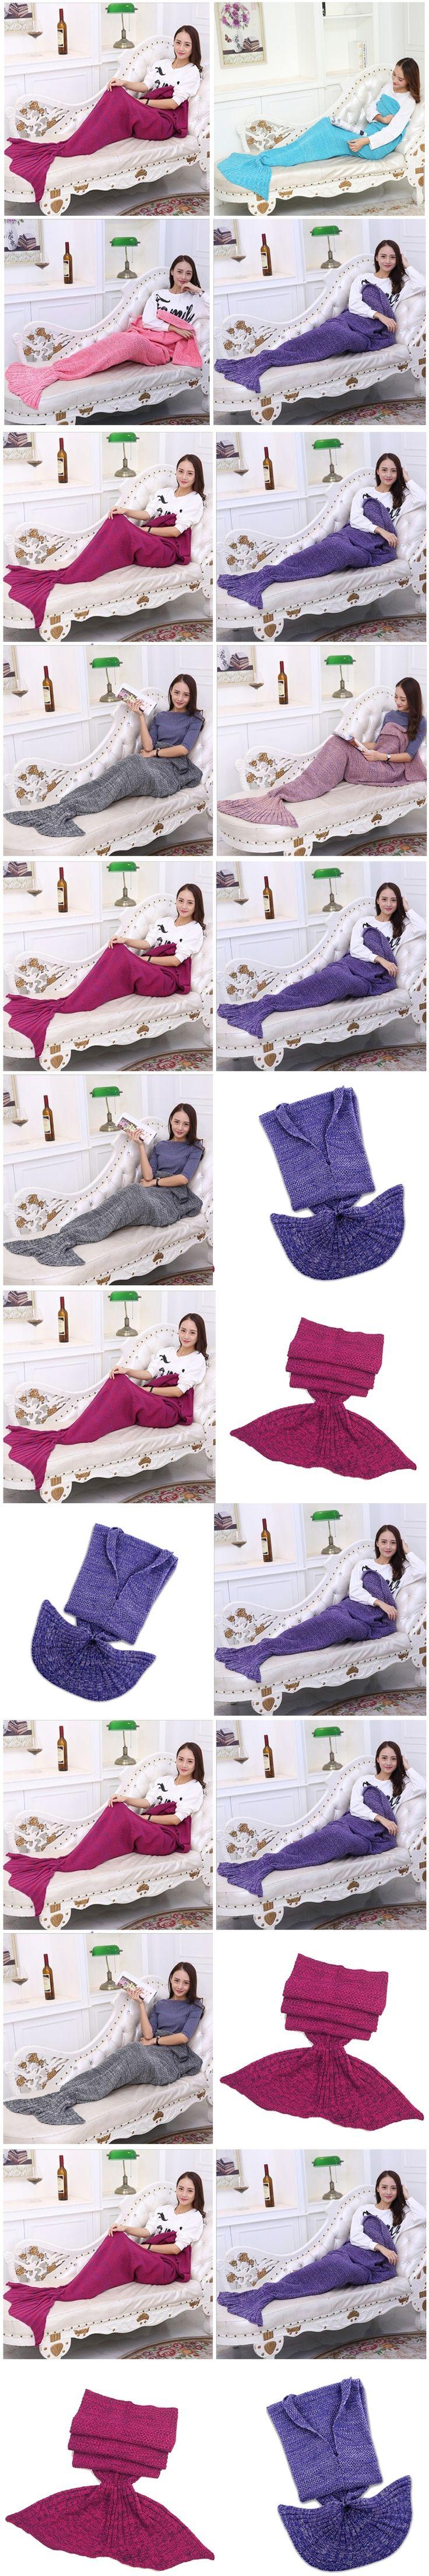 180*90CM Cute Yarn Knitted Mermaid Tail Blanket Super Soft Sleeping Bed Handmade Crochet Anti-Pilling Portable Blanket 10 Colors